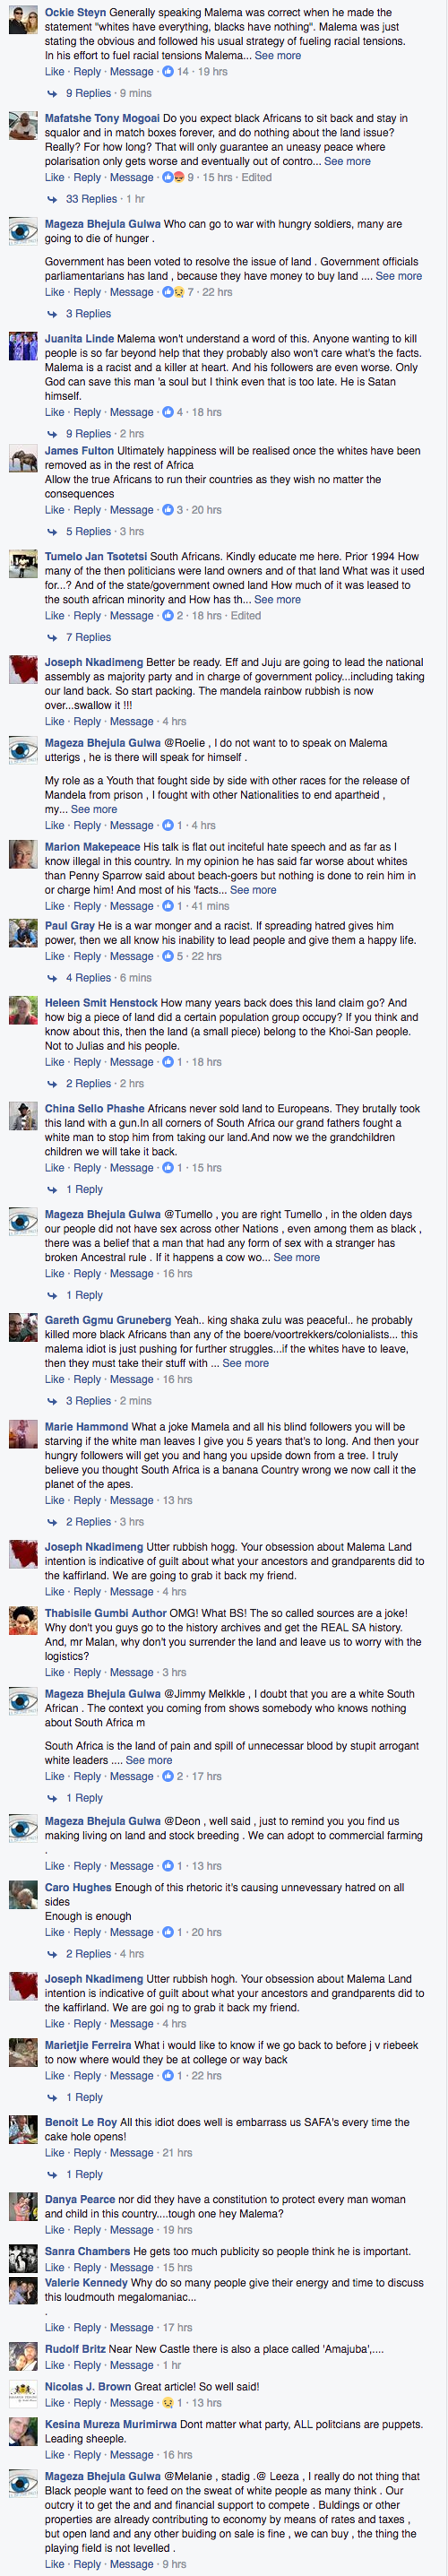 facebook_comments_rian_malan